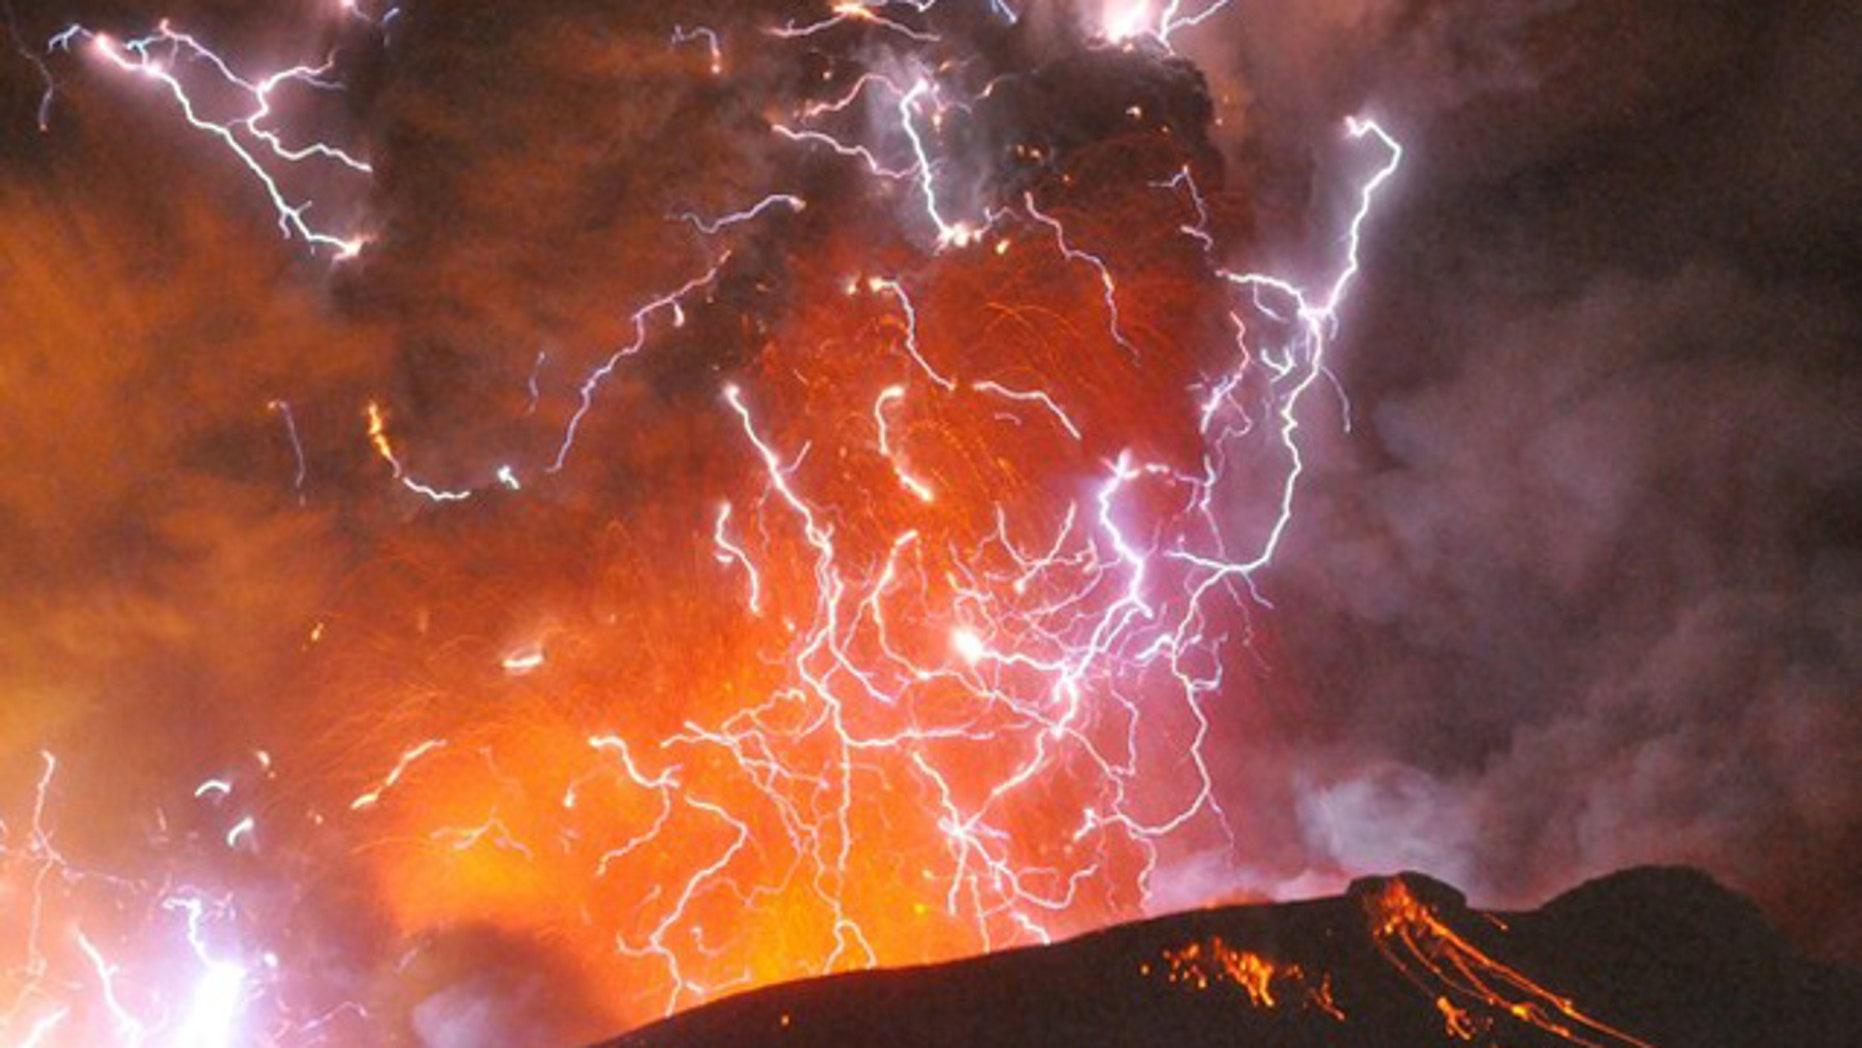 Jan. 28: Volcanic lightning or a dirty thunderstorm is seen above Shinmoedake peak as it erupts, between Miyazaki and Kagoshima prefectures, in this photo taken from Kirishima city and released by Minami-Nippon Shimbun.